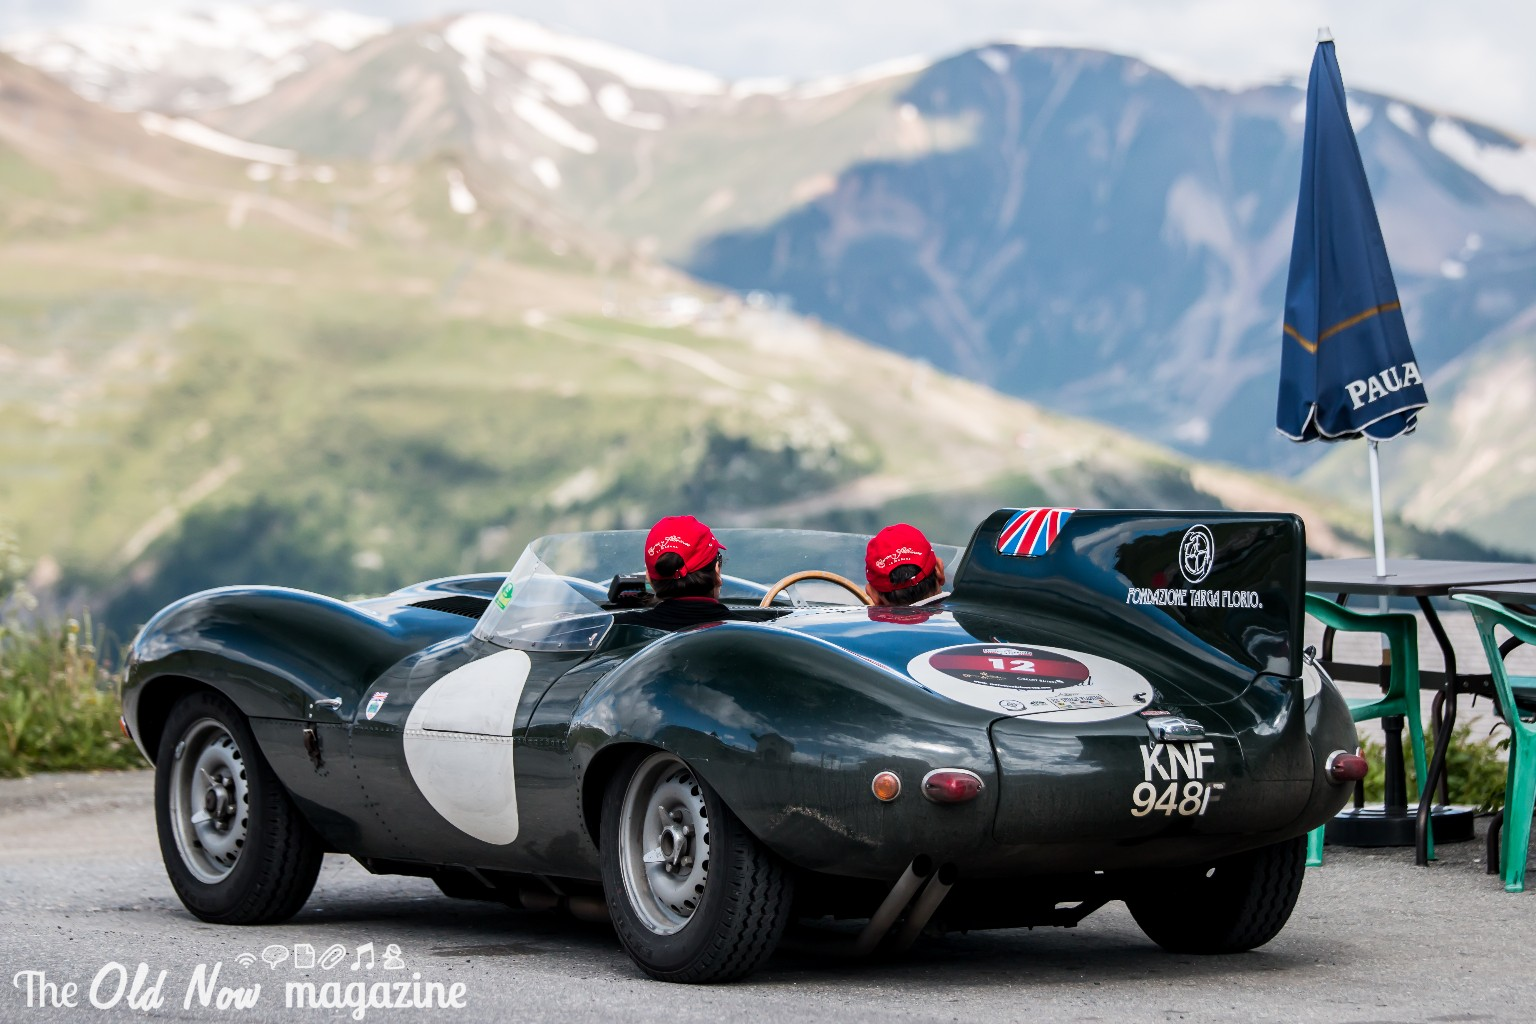 Jaguar F-Type (26)